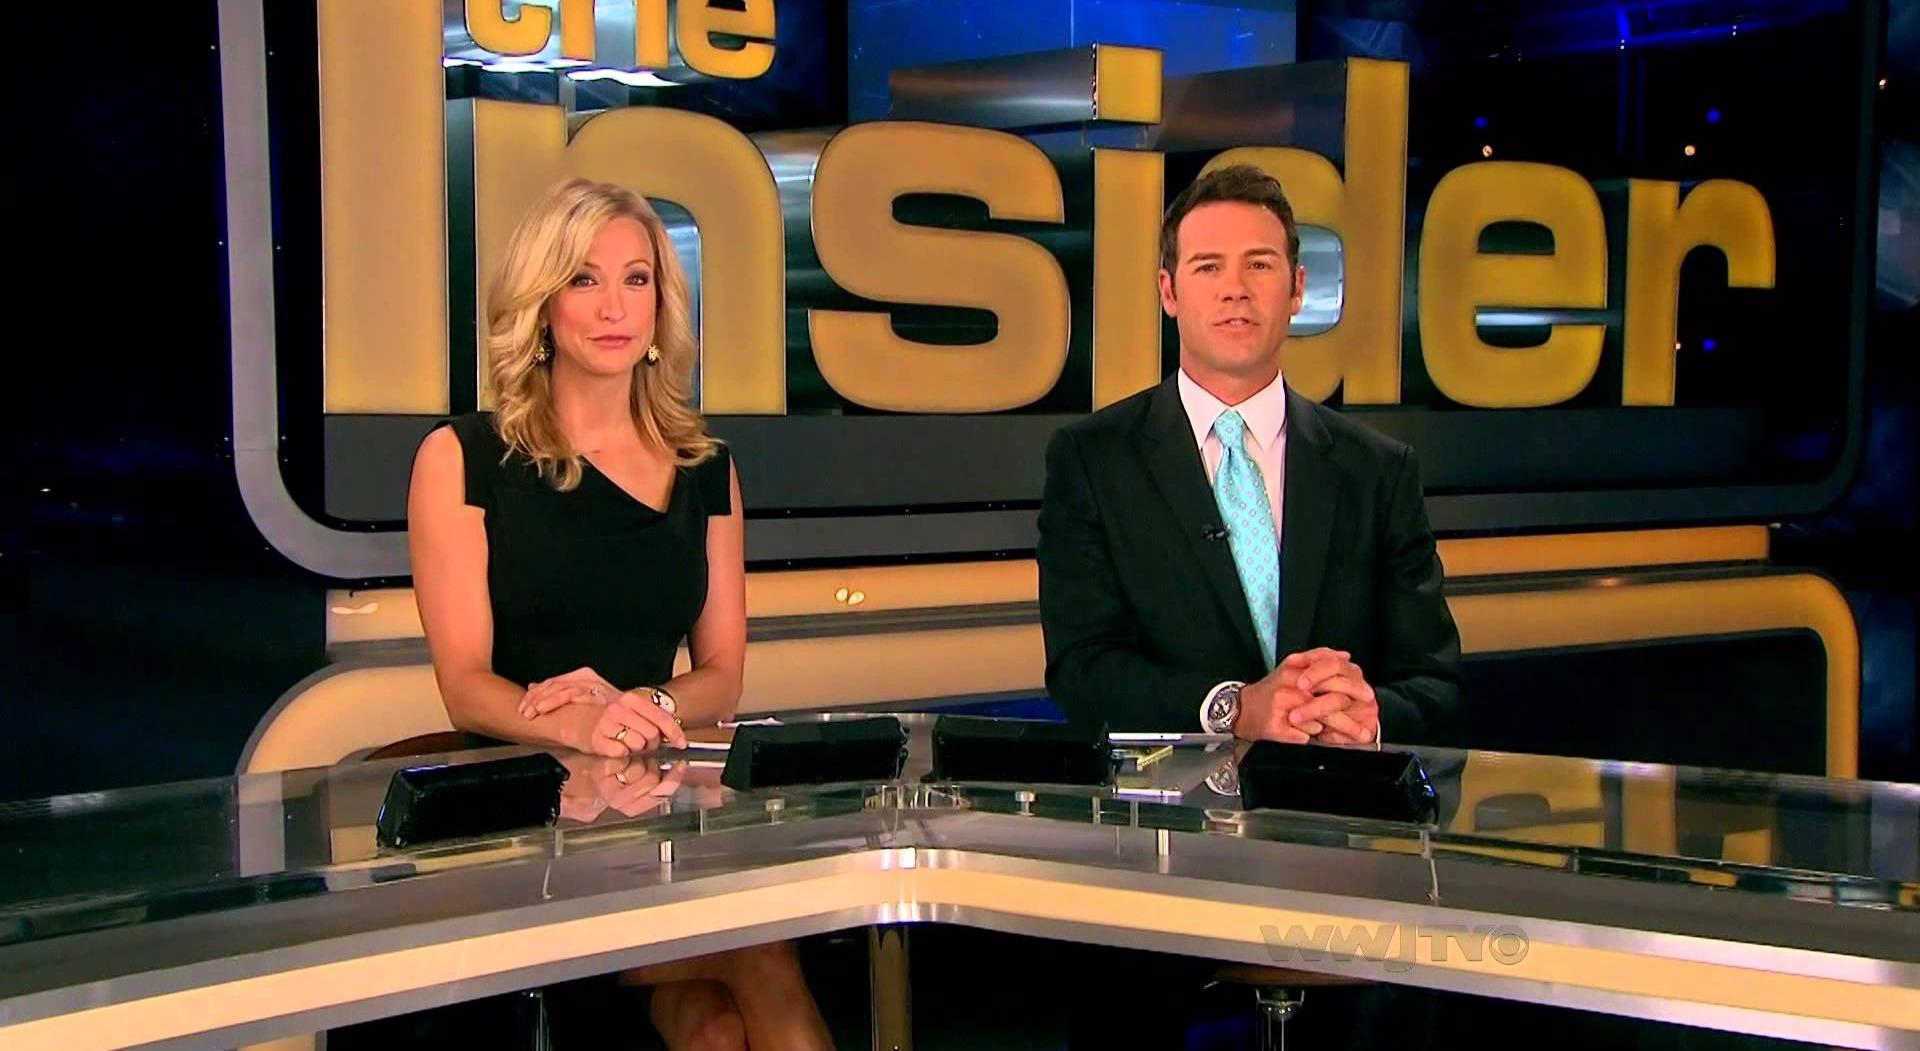 Lara Spencer co-hosting The Insider with Chris Jacobs